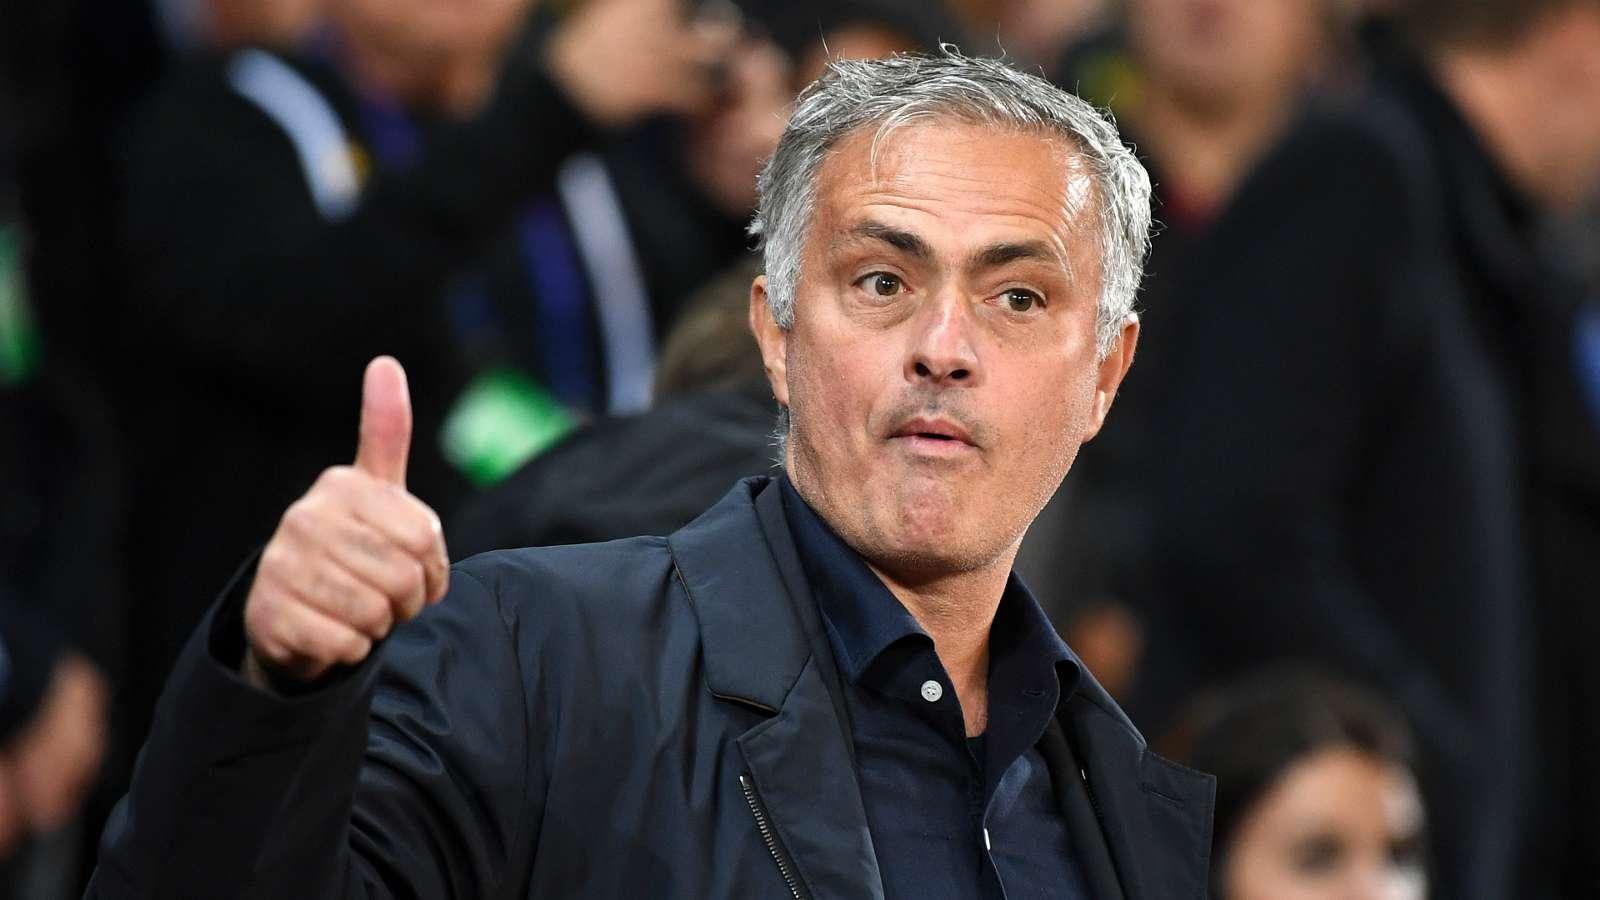 mourinho - EPL: Premier League manager leaves club as Mourinho is set to take over